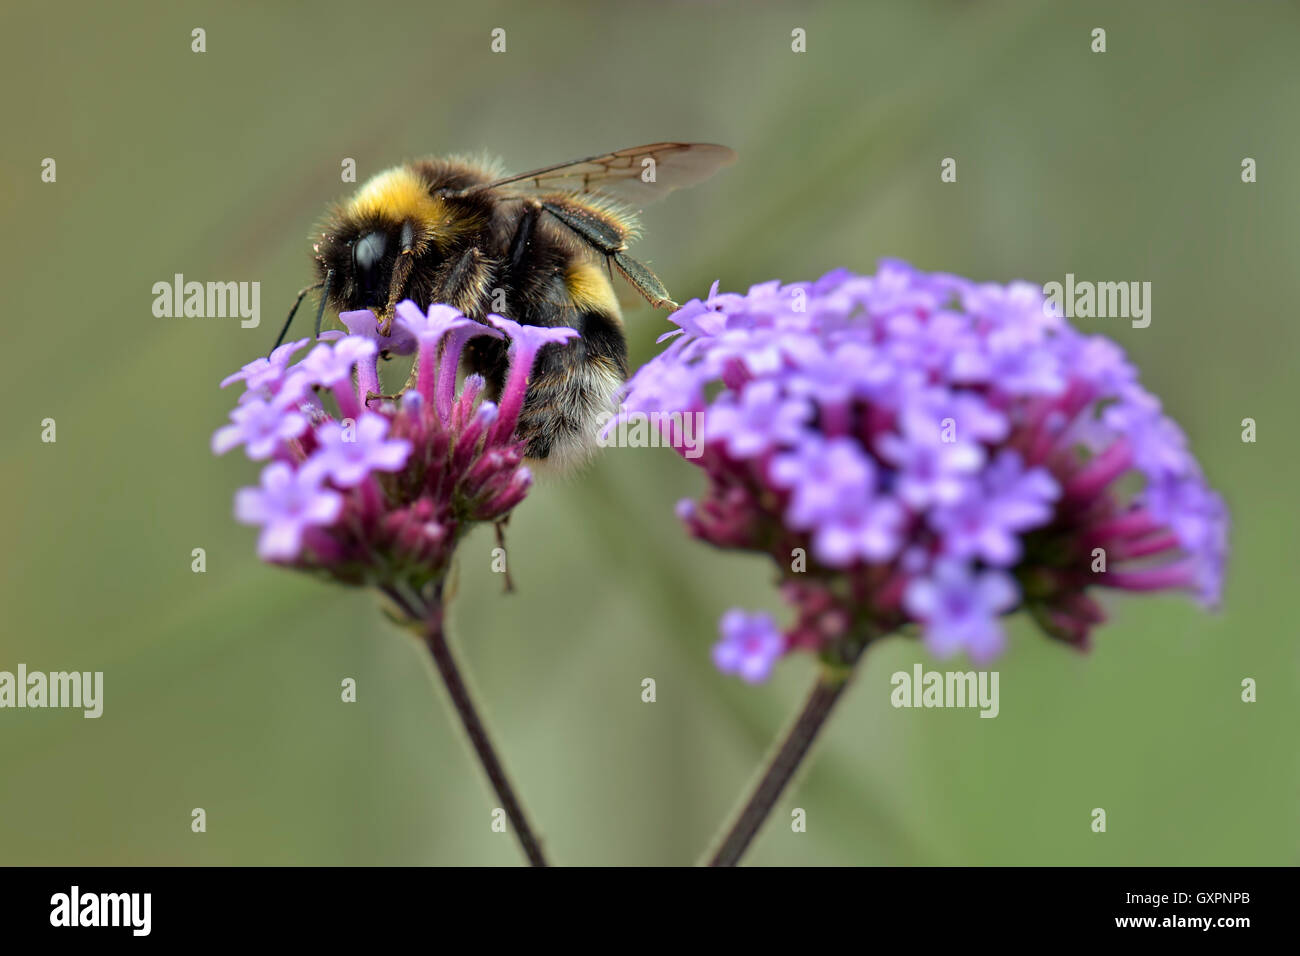 Abeille sur fleur de verveine Photo Stock